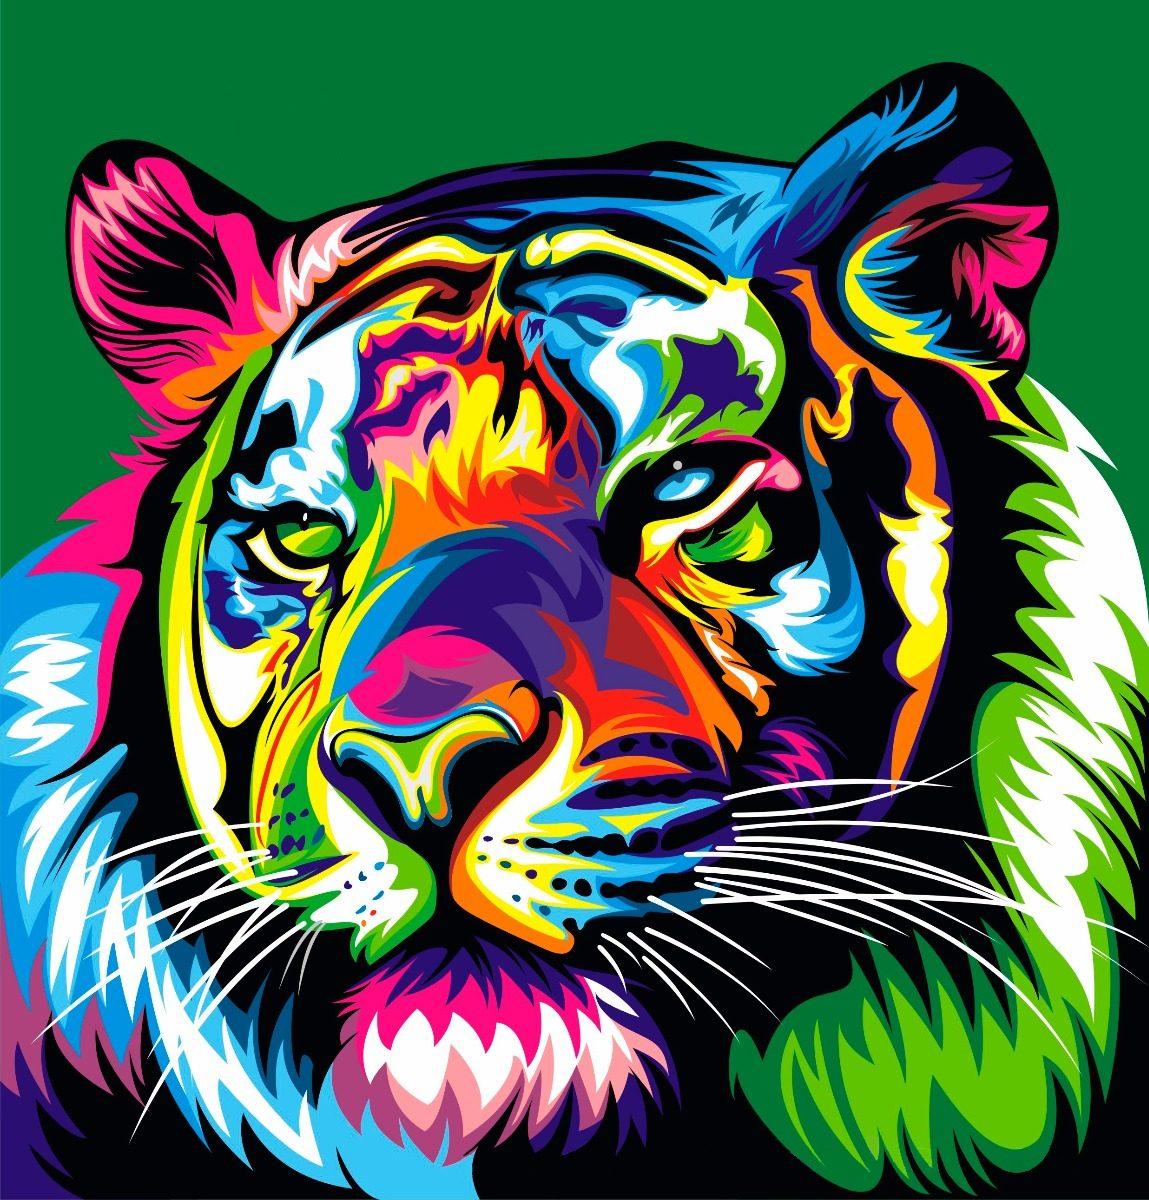 Cuadros Modernos Animales Selva Decoración Full Color Tiger - $ 225 ...